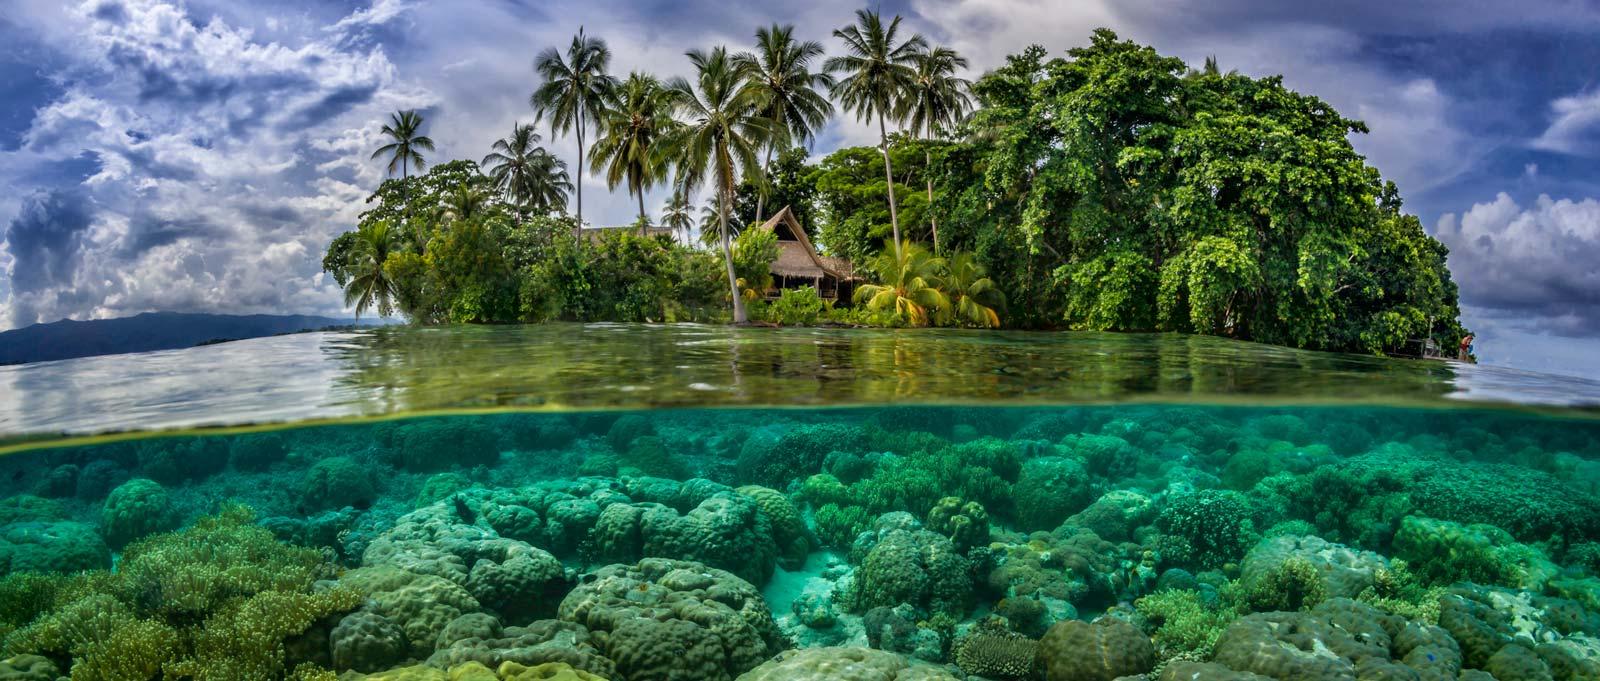 Marovo Lagoon, Solomon Islands (Photo: Getty Images)